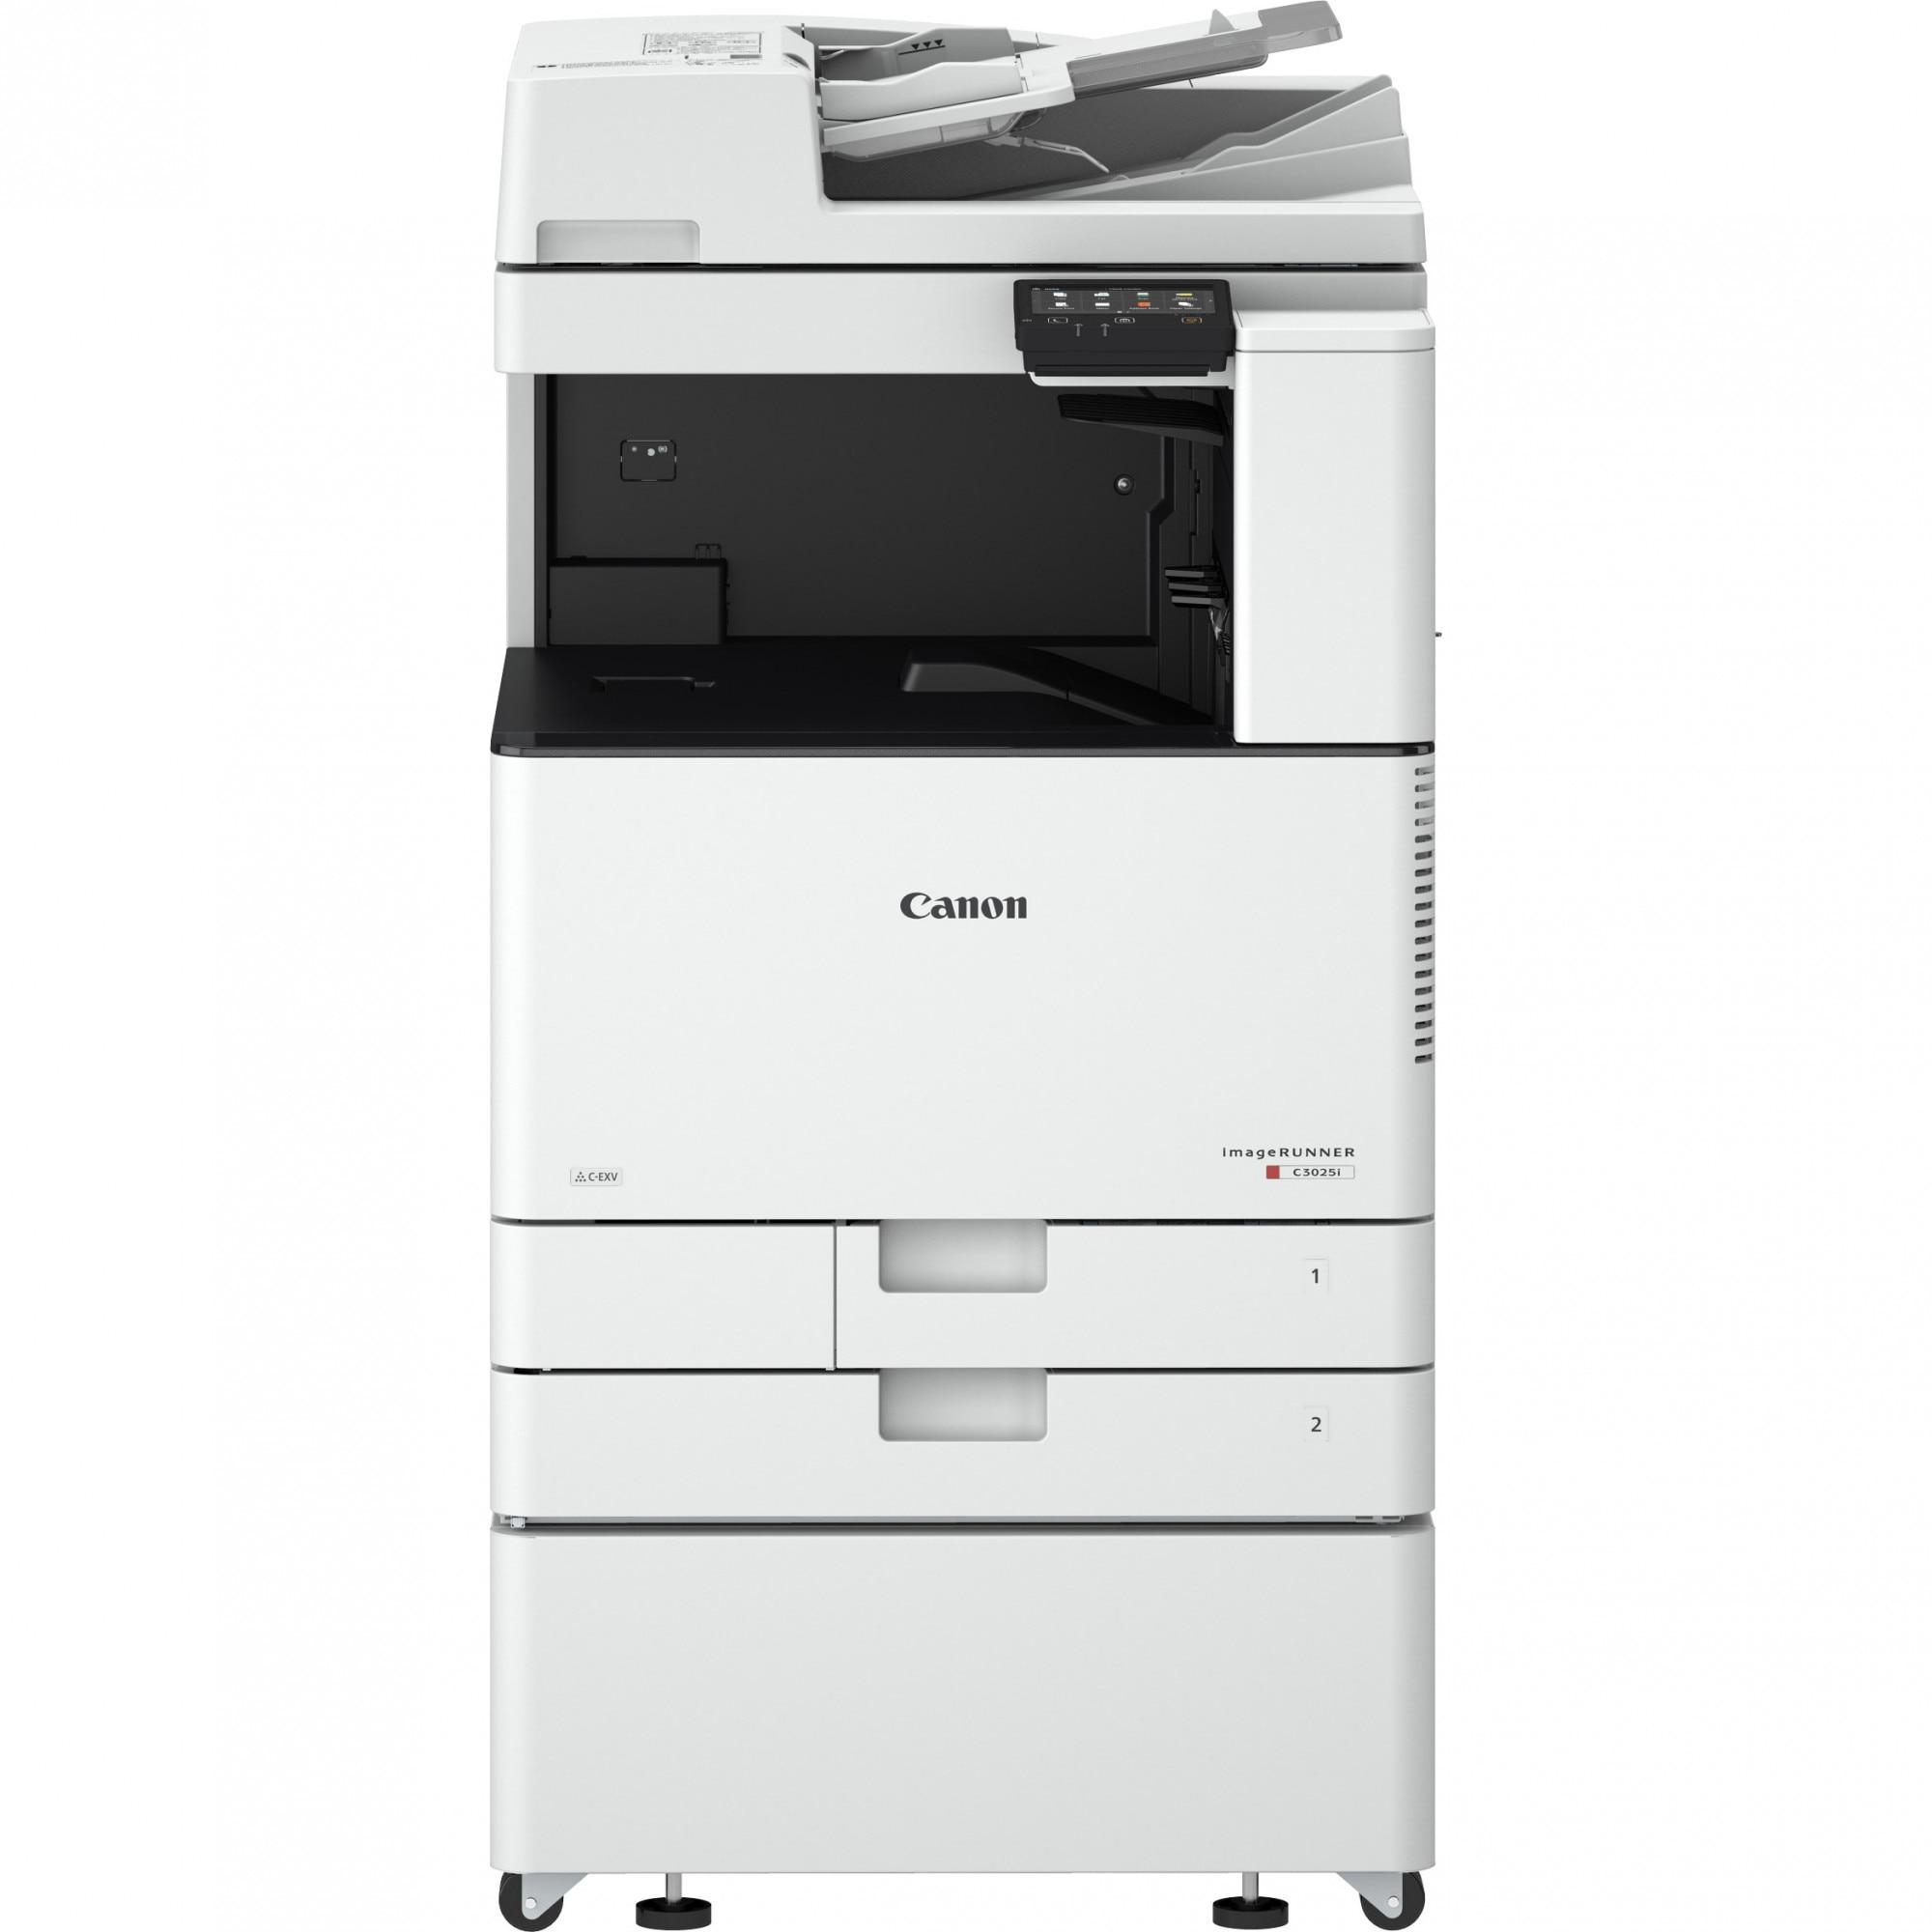 Fotografie Multifunctional laser A3 color Canon imageRUNNER C3025i + Piedestal S1 + Toner C/M/Y/B